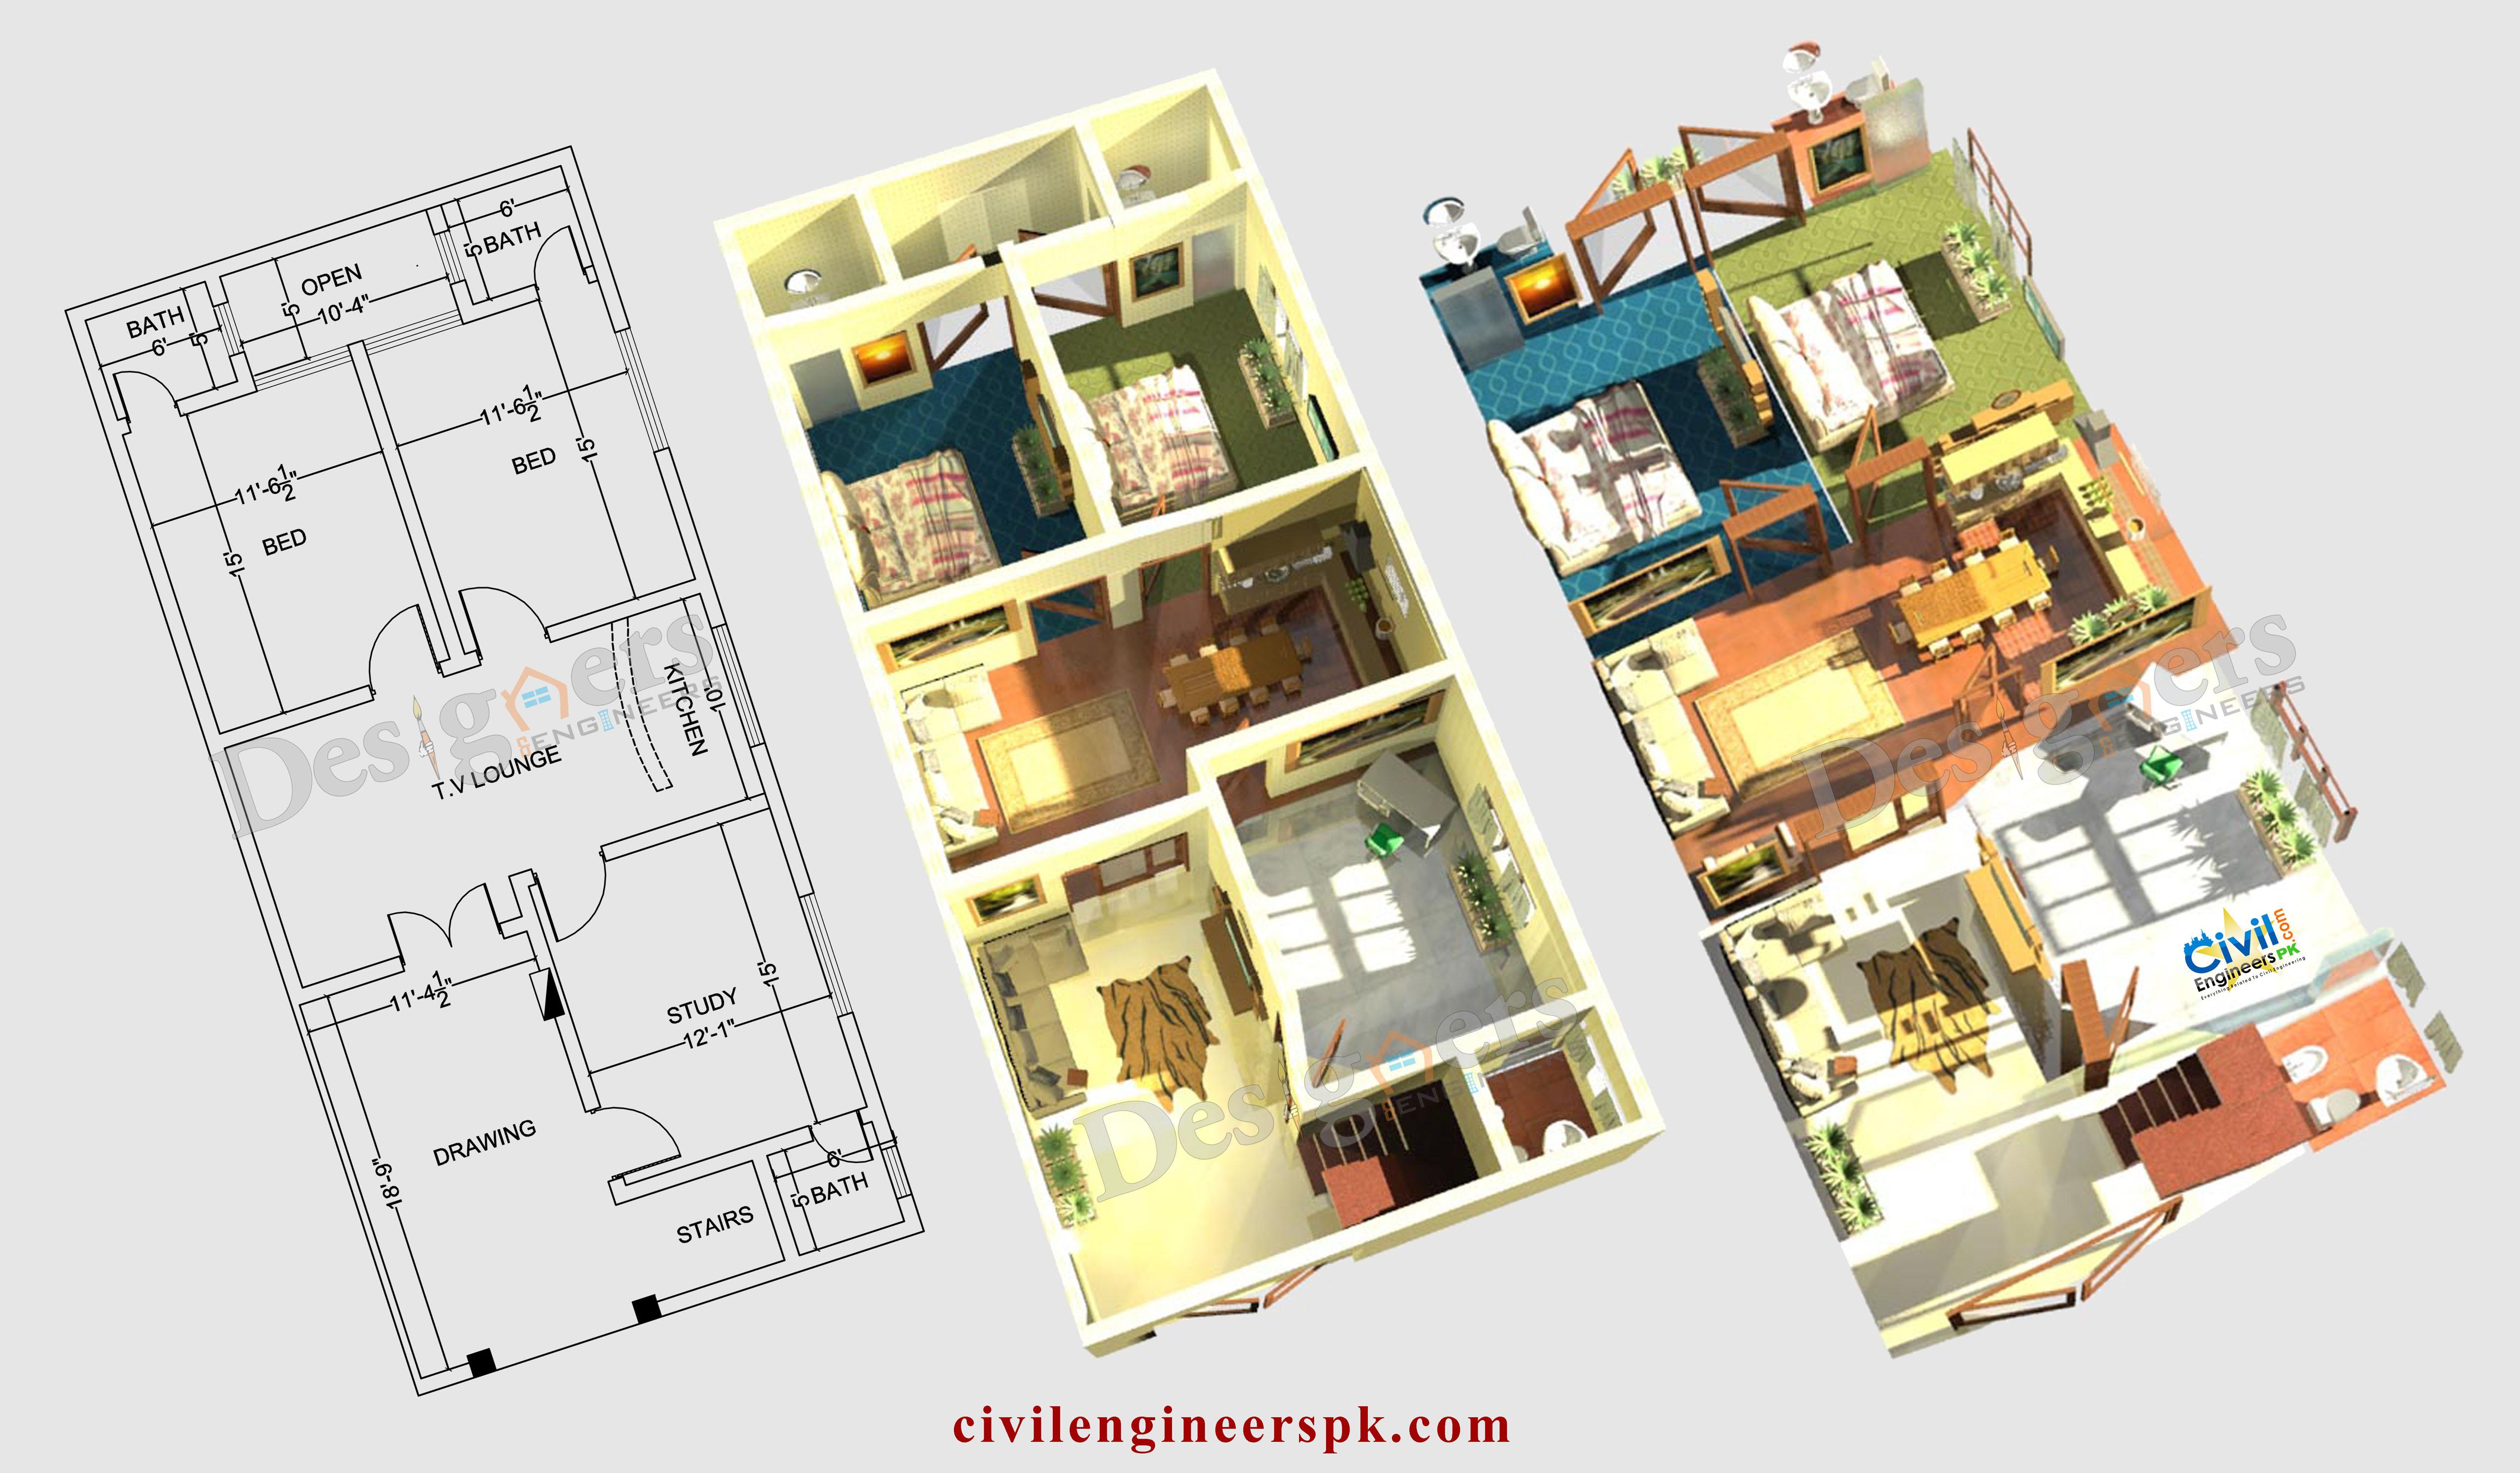 6 Marla House Plans - Civil Engineers PK